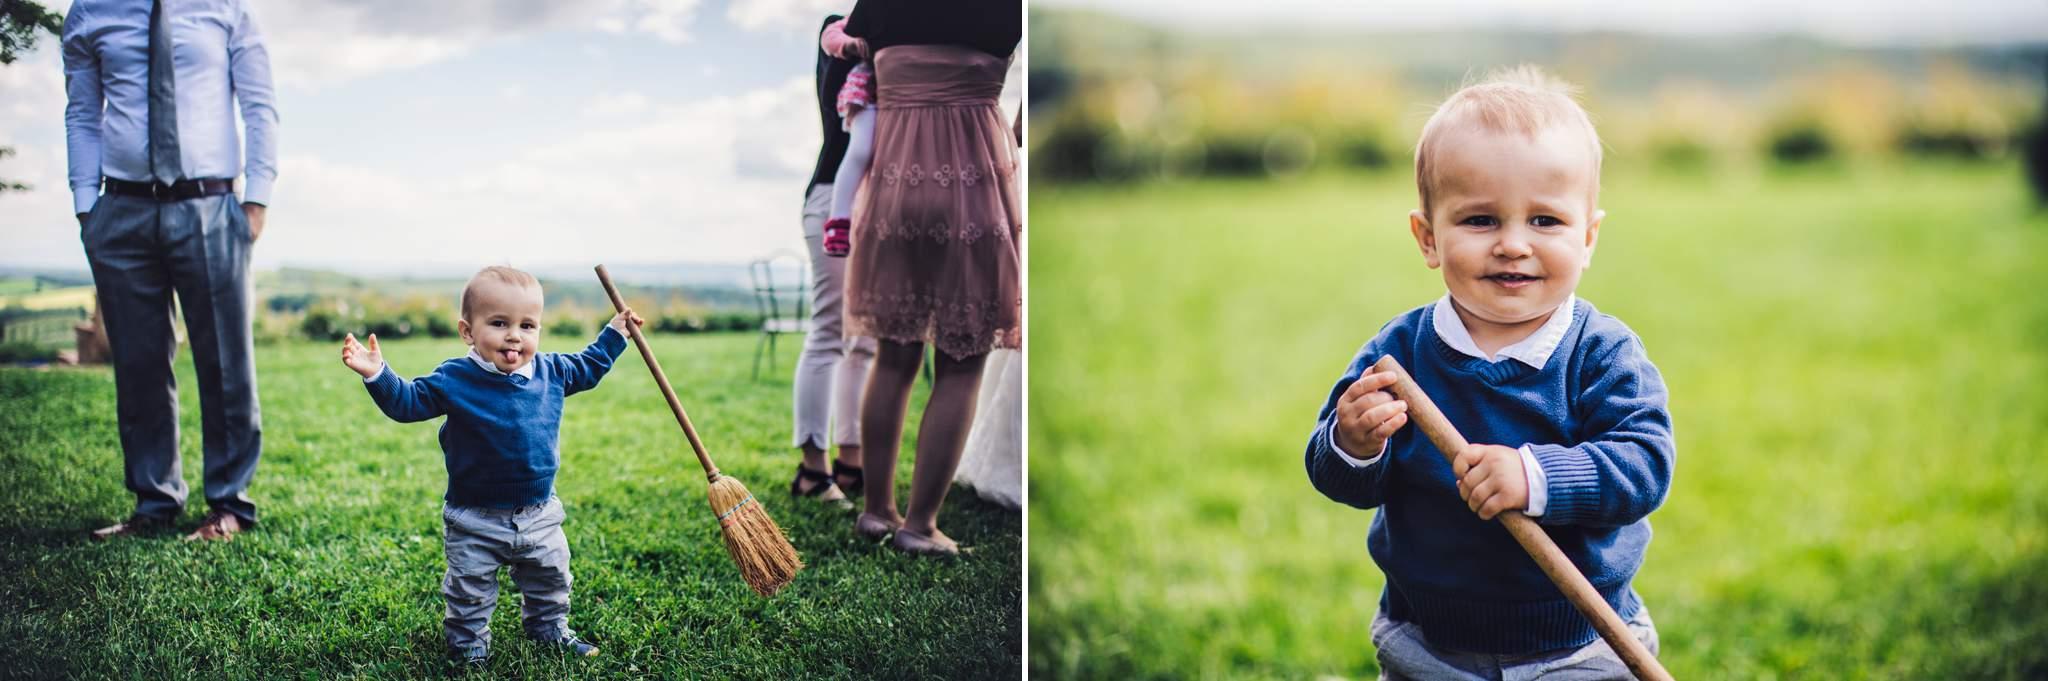 25wedding-photographer-tuscany-siena